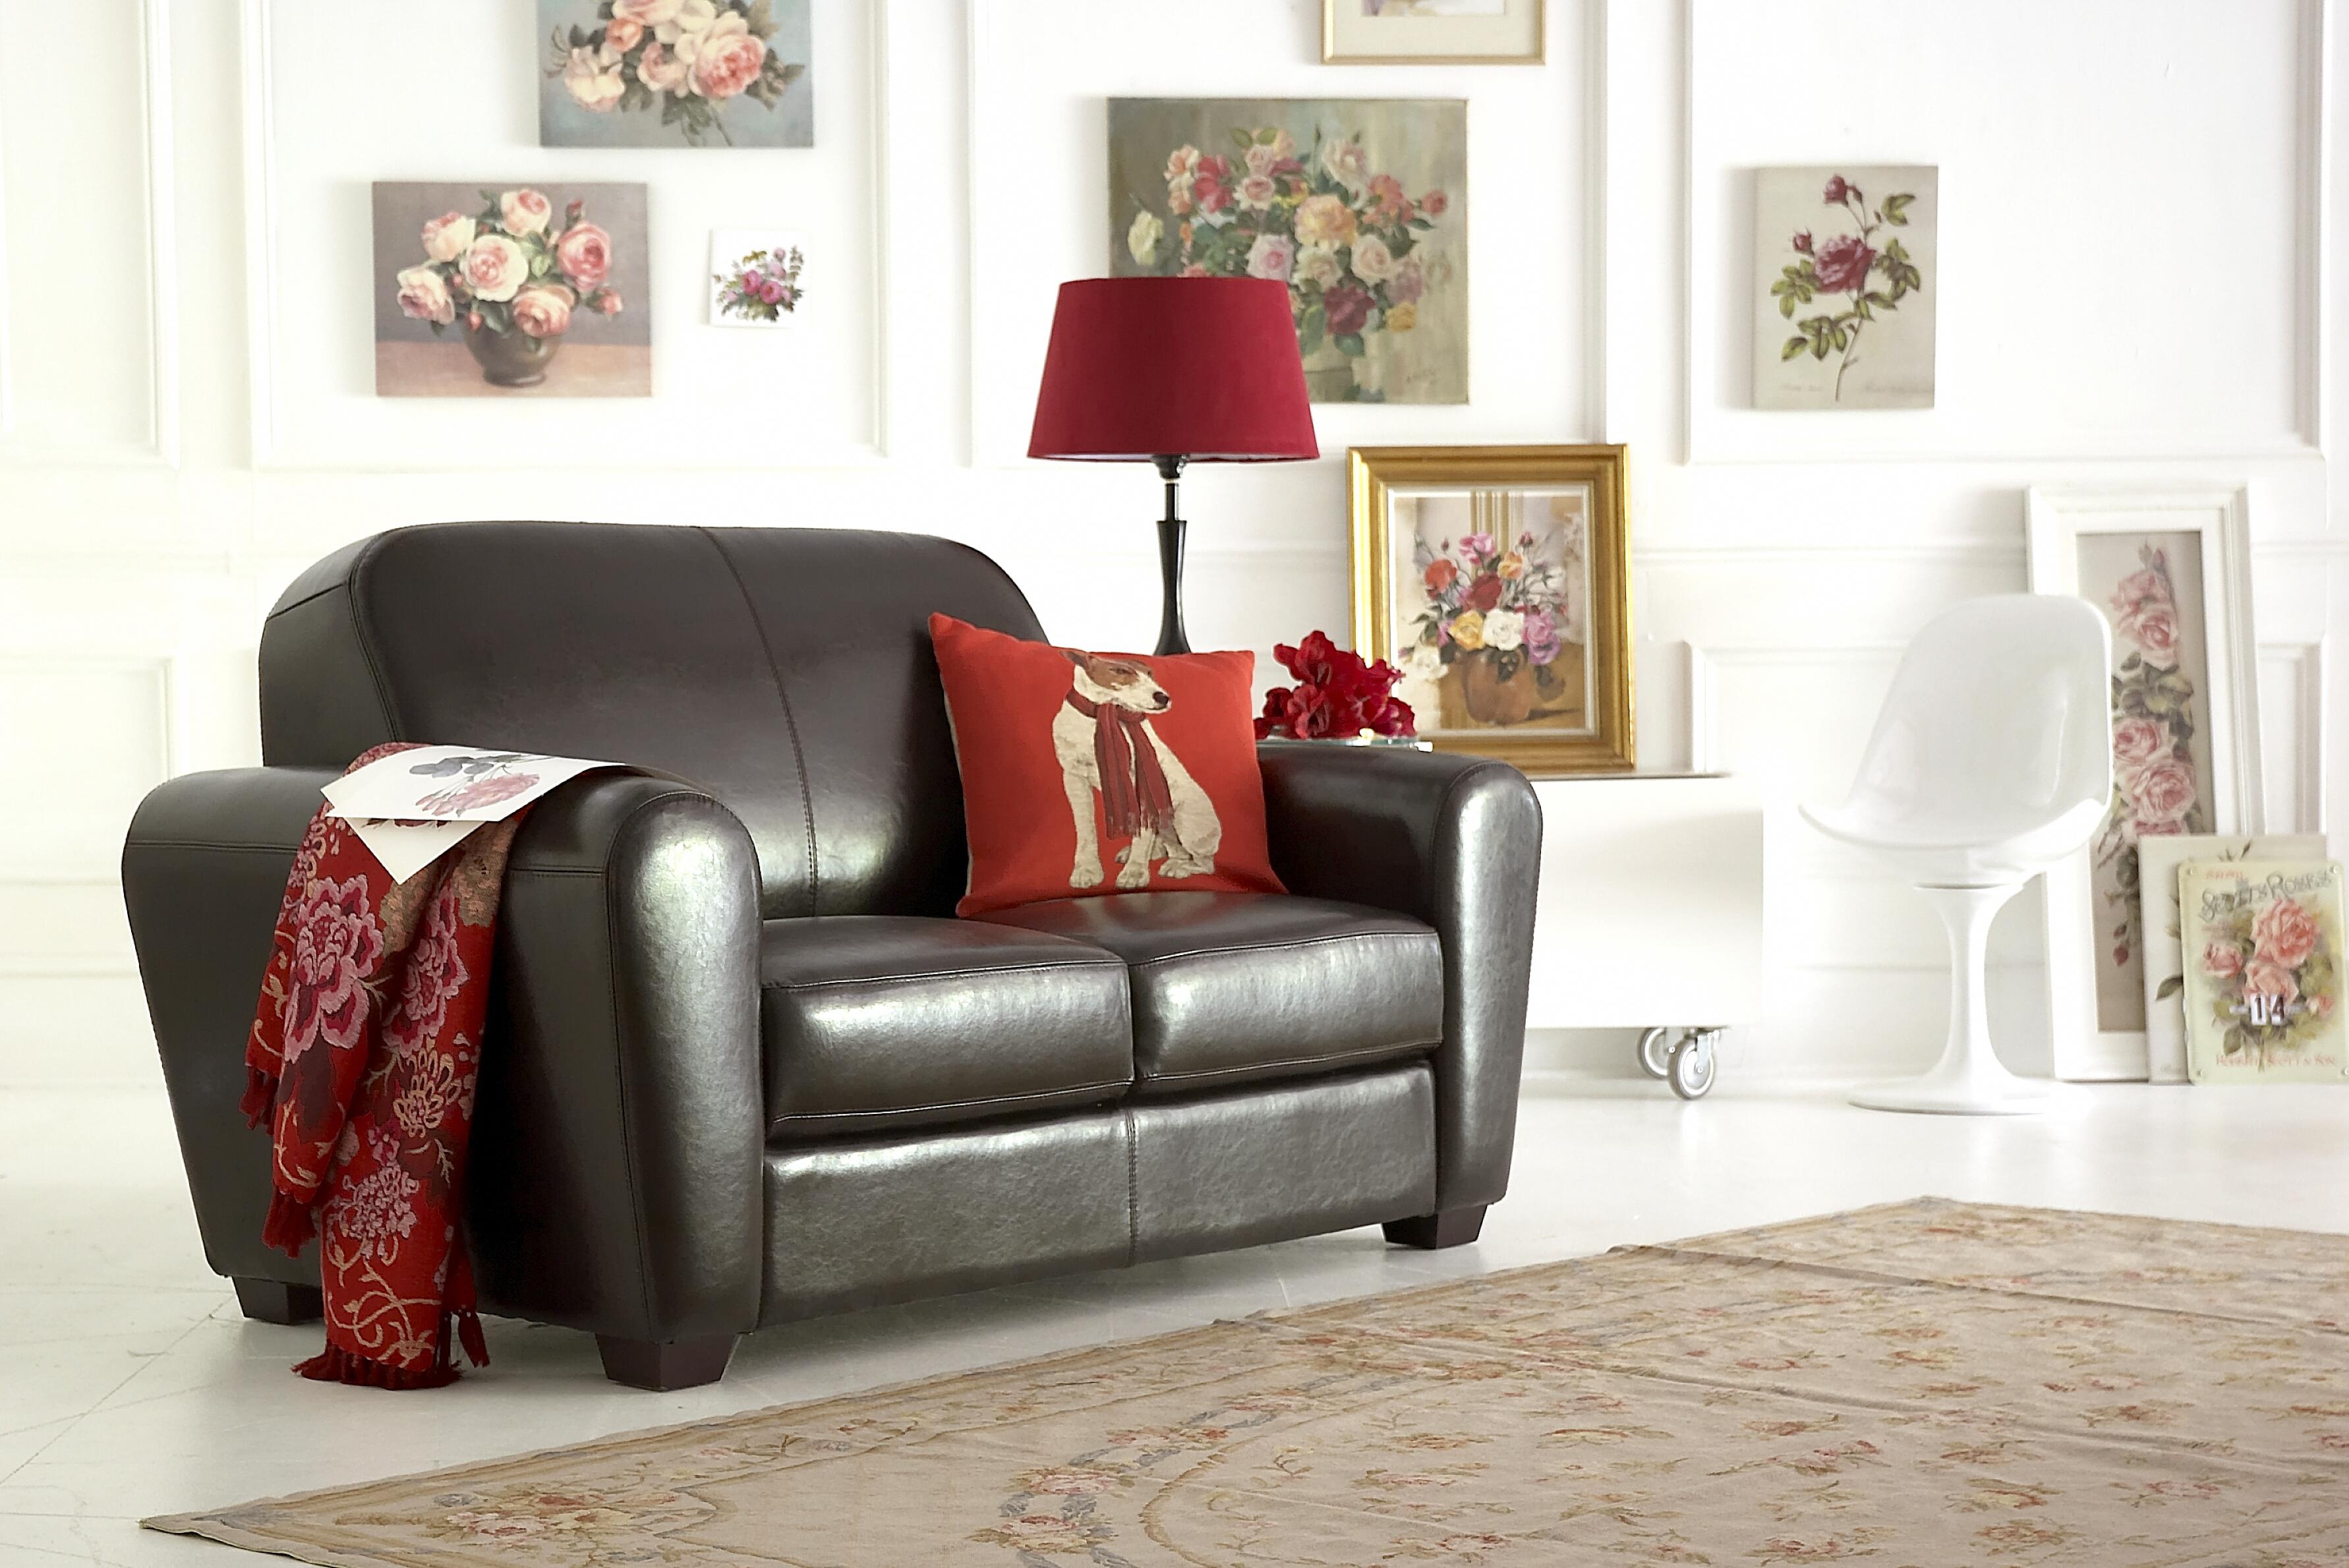 Paris Leather Sofa by Leather Sofas Online - Dakota DigitalLtd